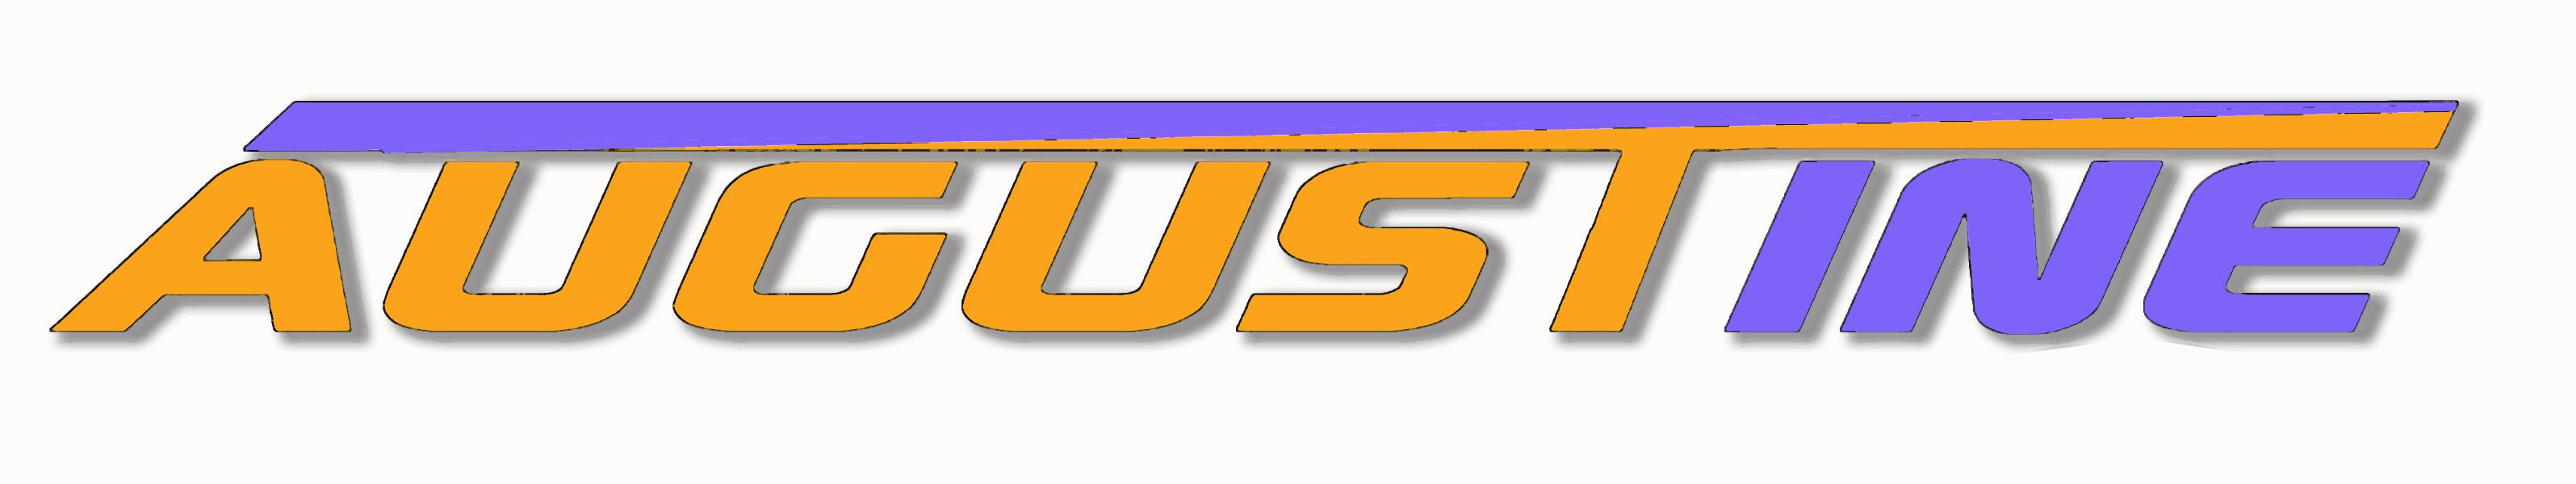 AUGUSTINE E-BIKES 2019